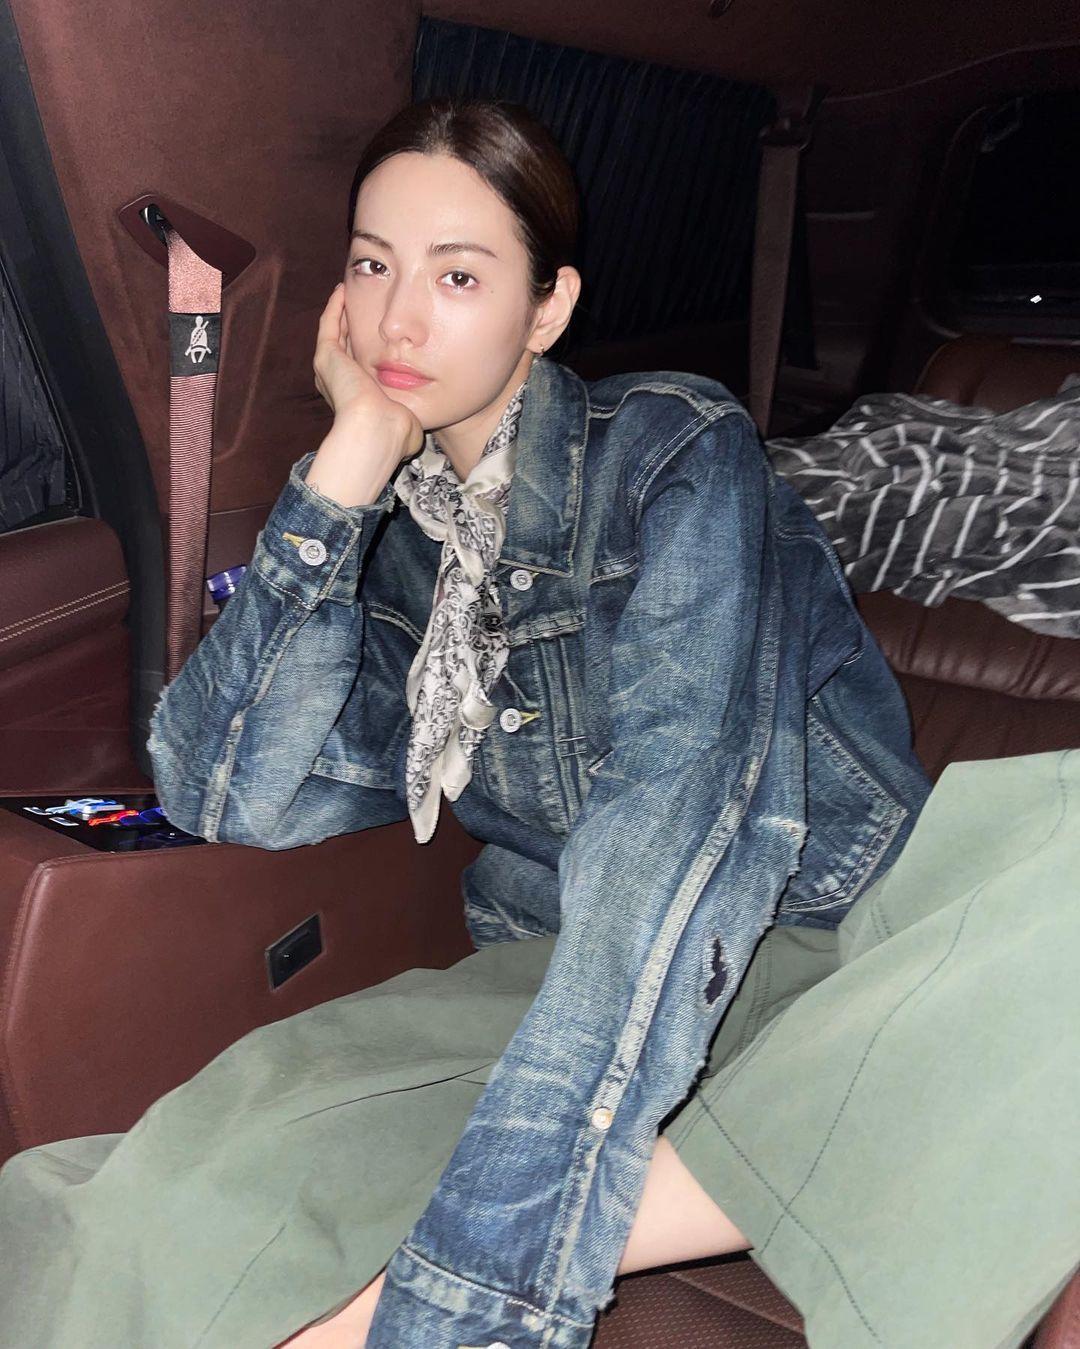 K-pop idols who are also actresses: Nana